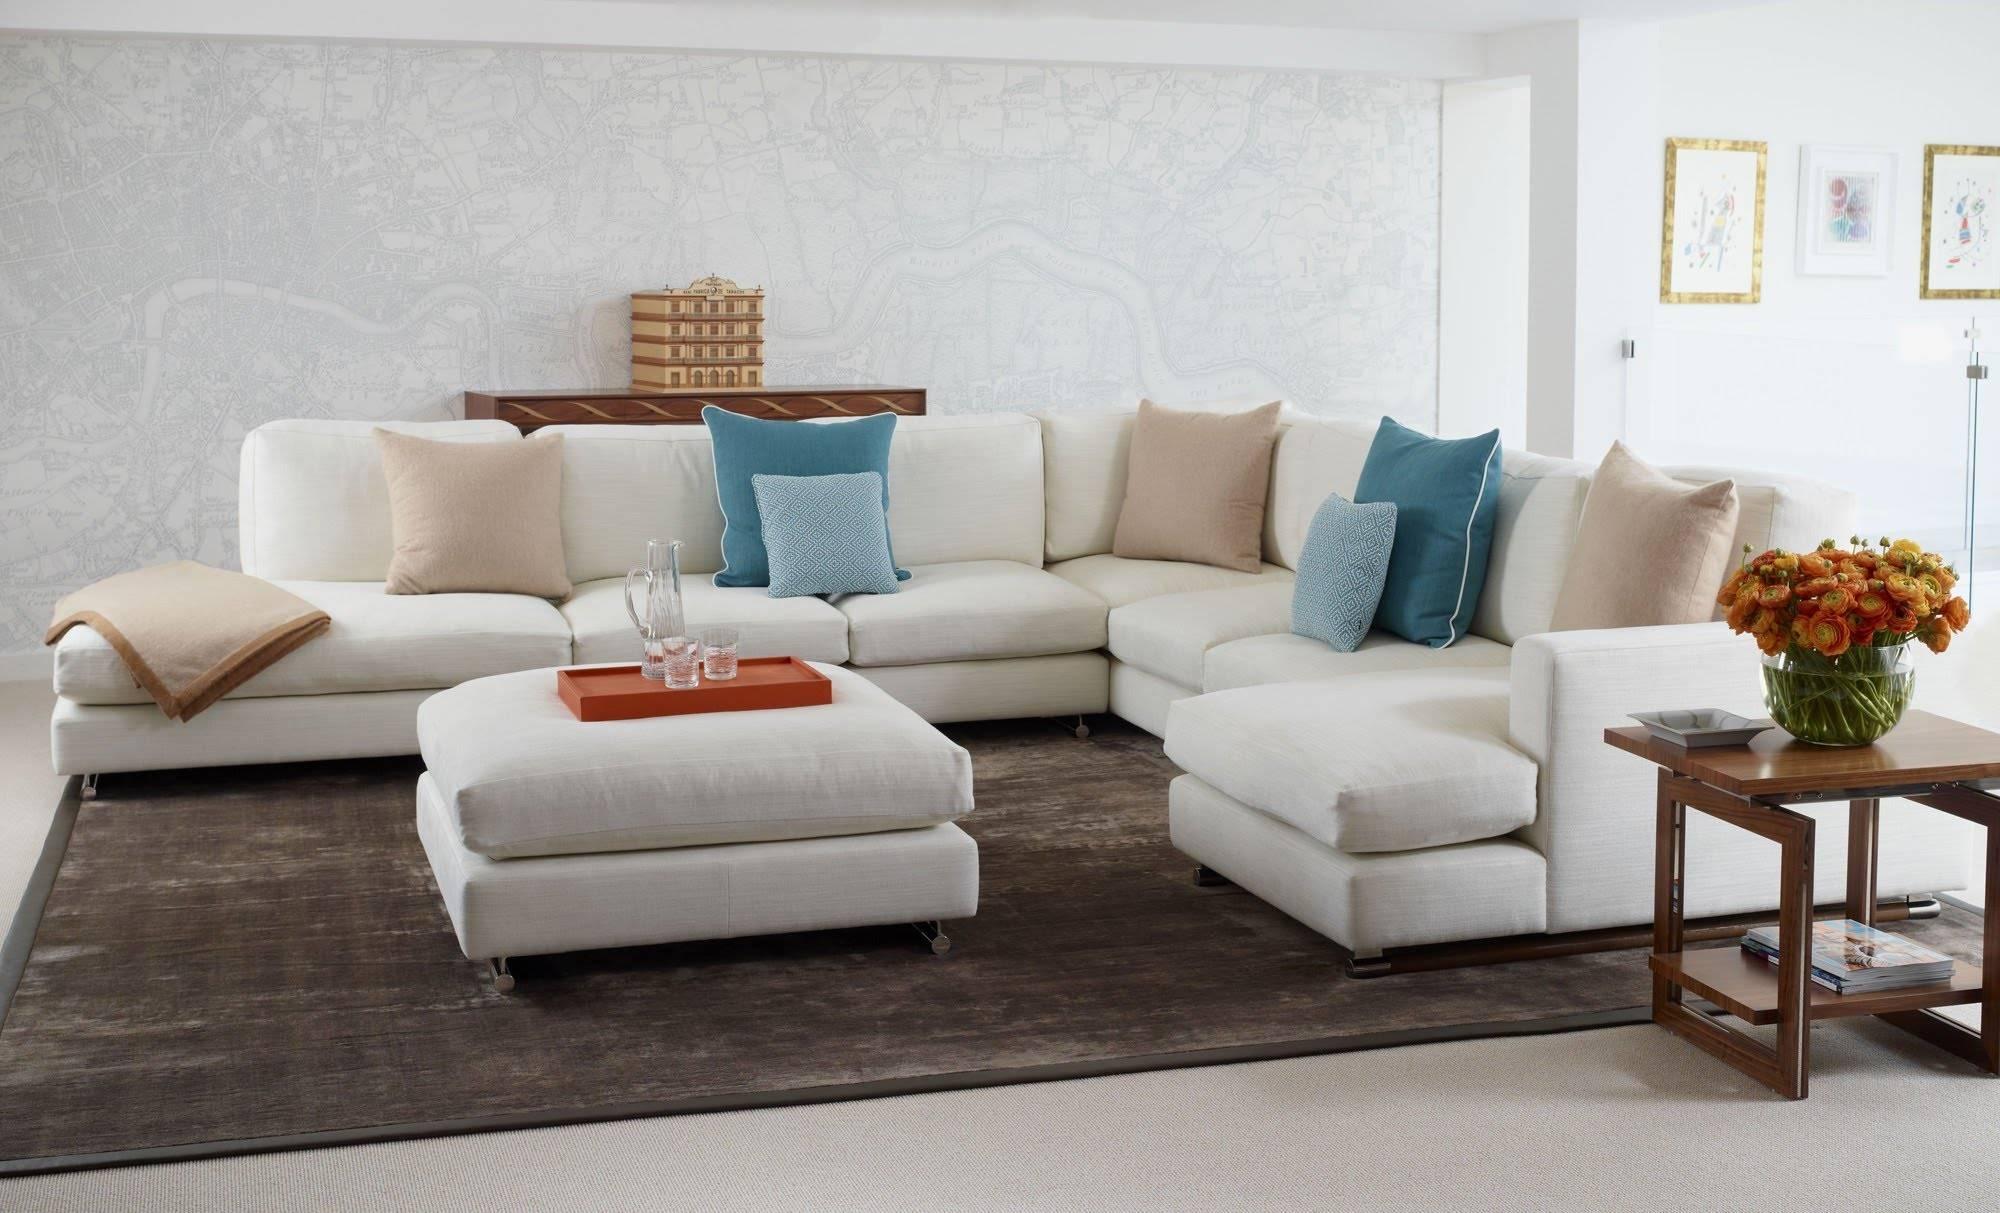 Modular Sofa - Youtube in Modular Sofas (Image 9 of 15)